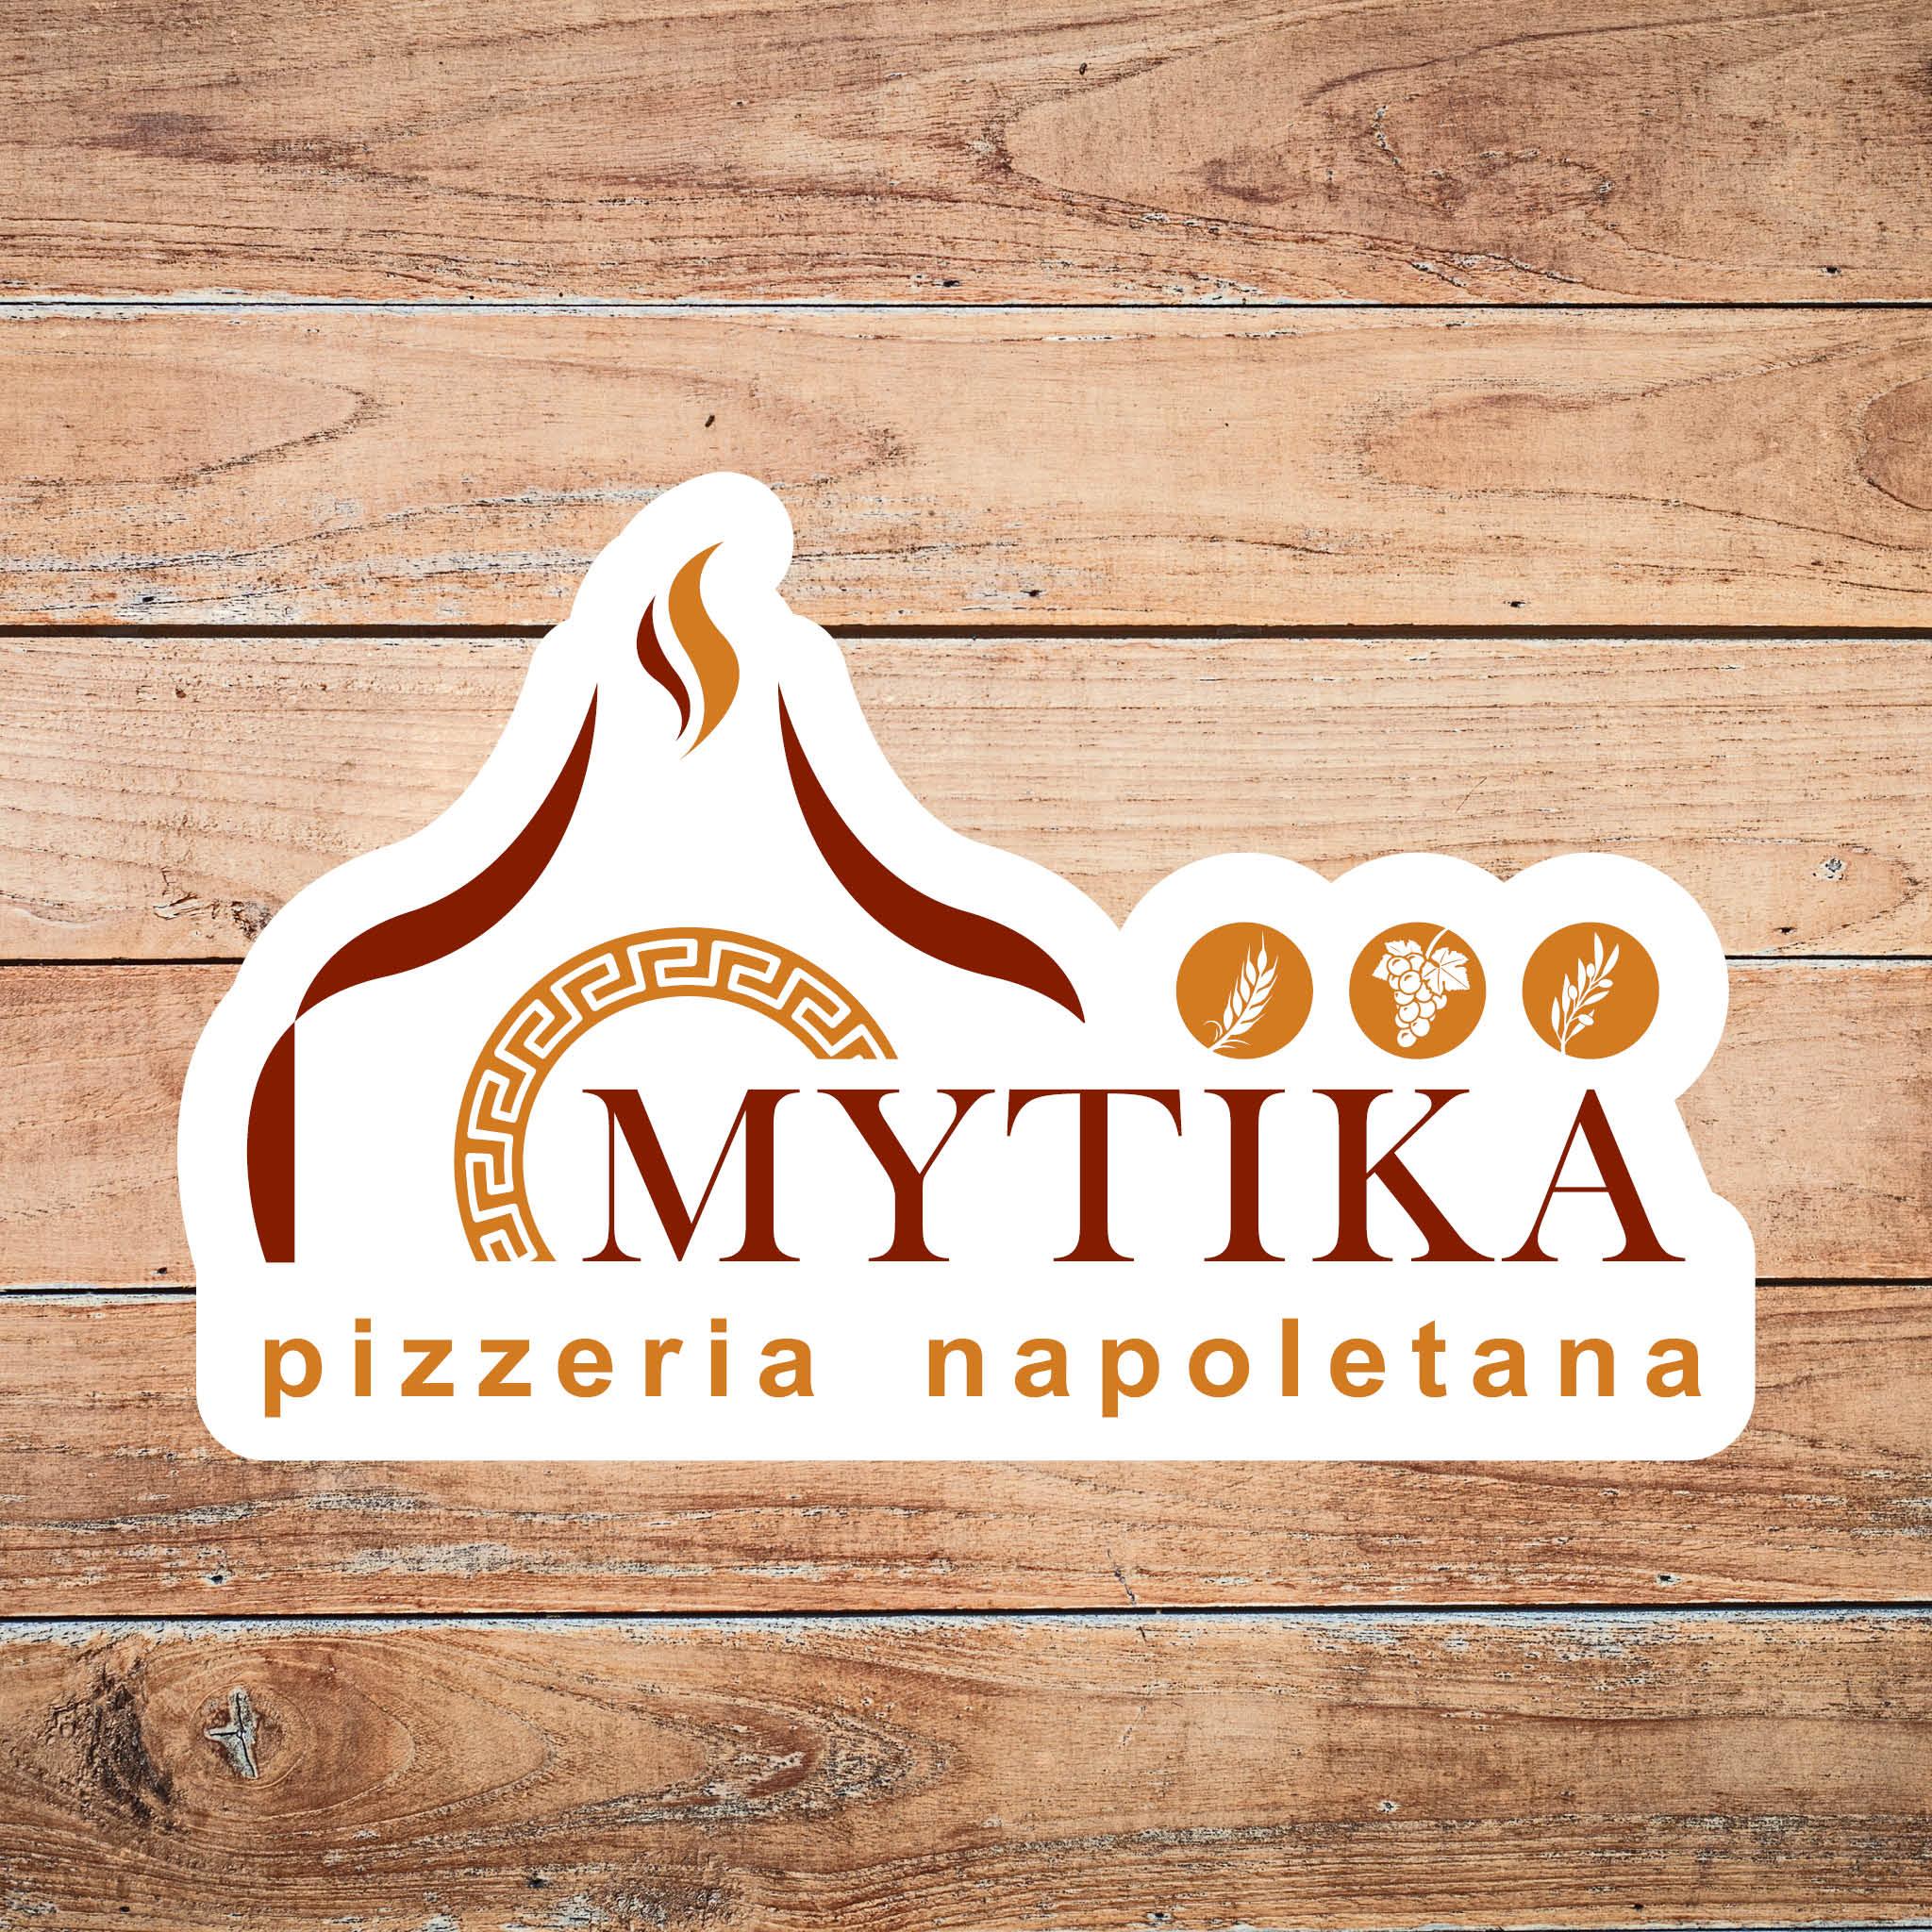 Mytika Pizzeria Napoletana